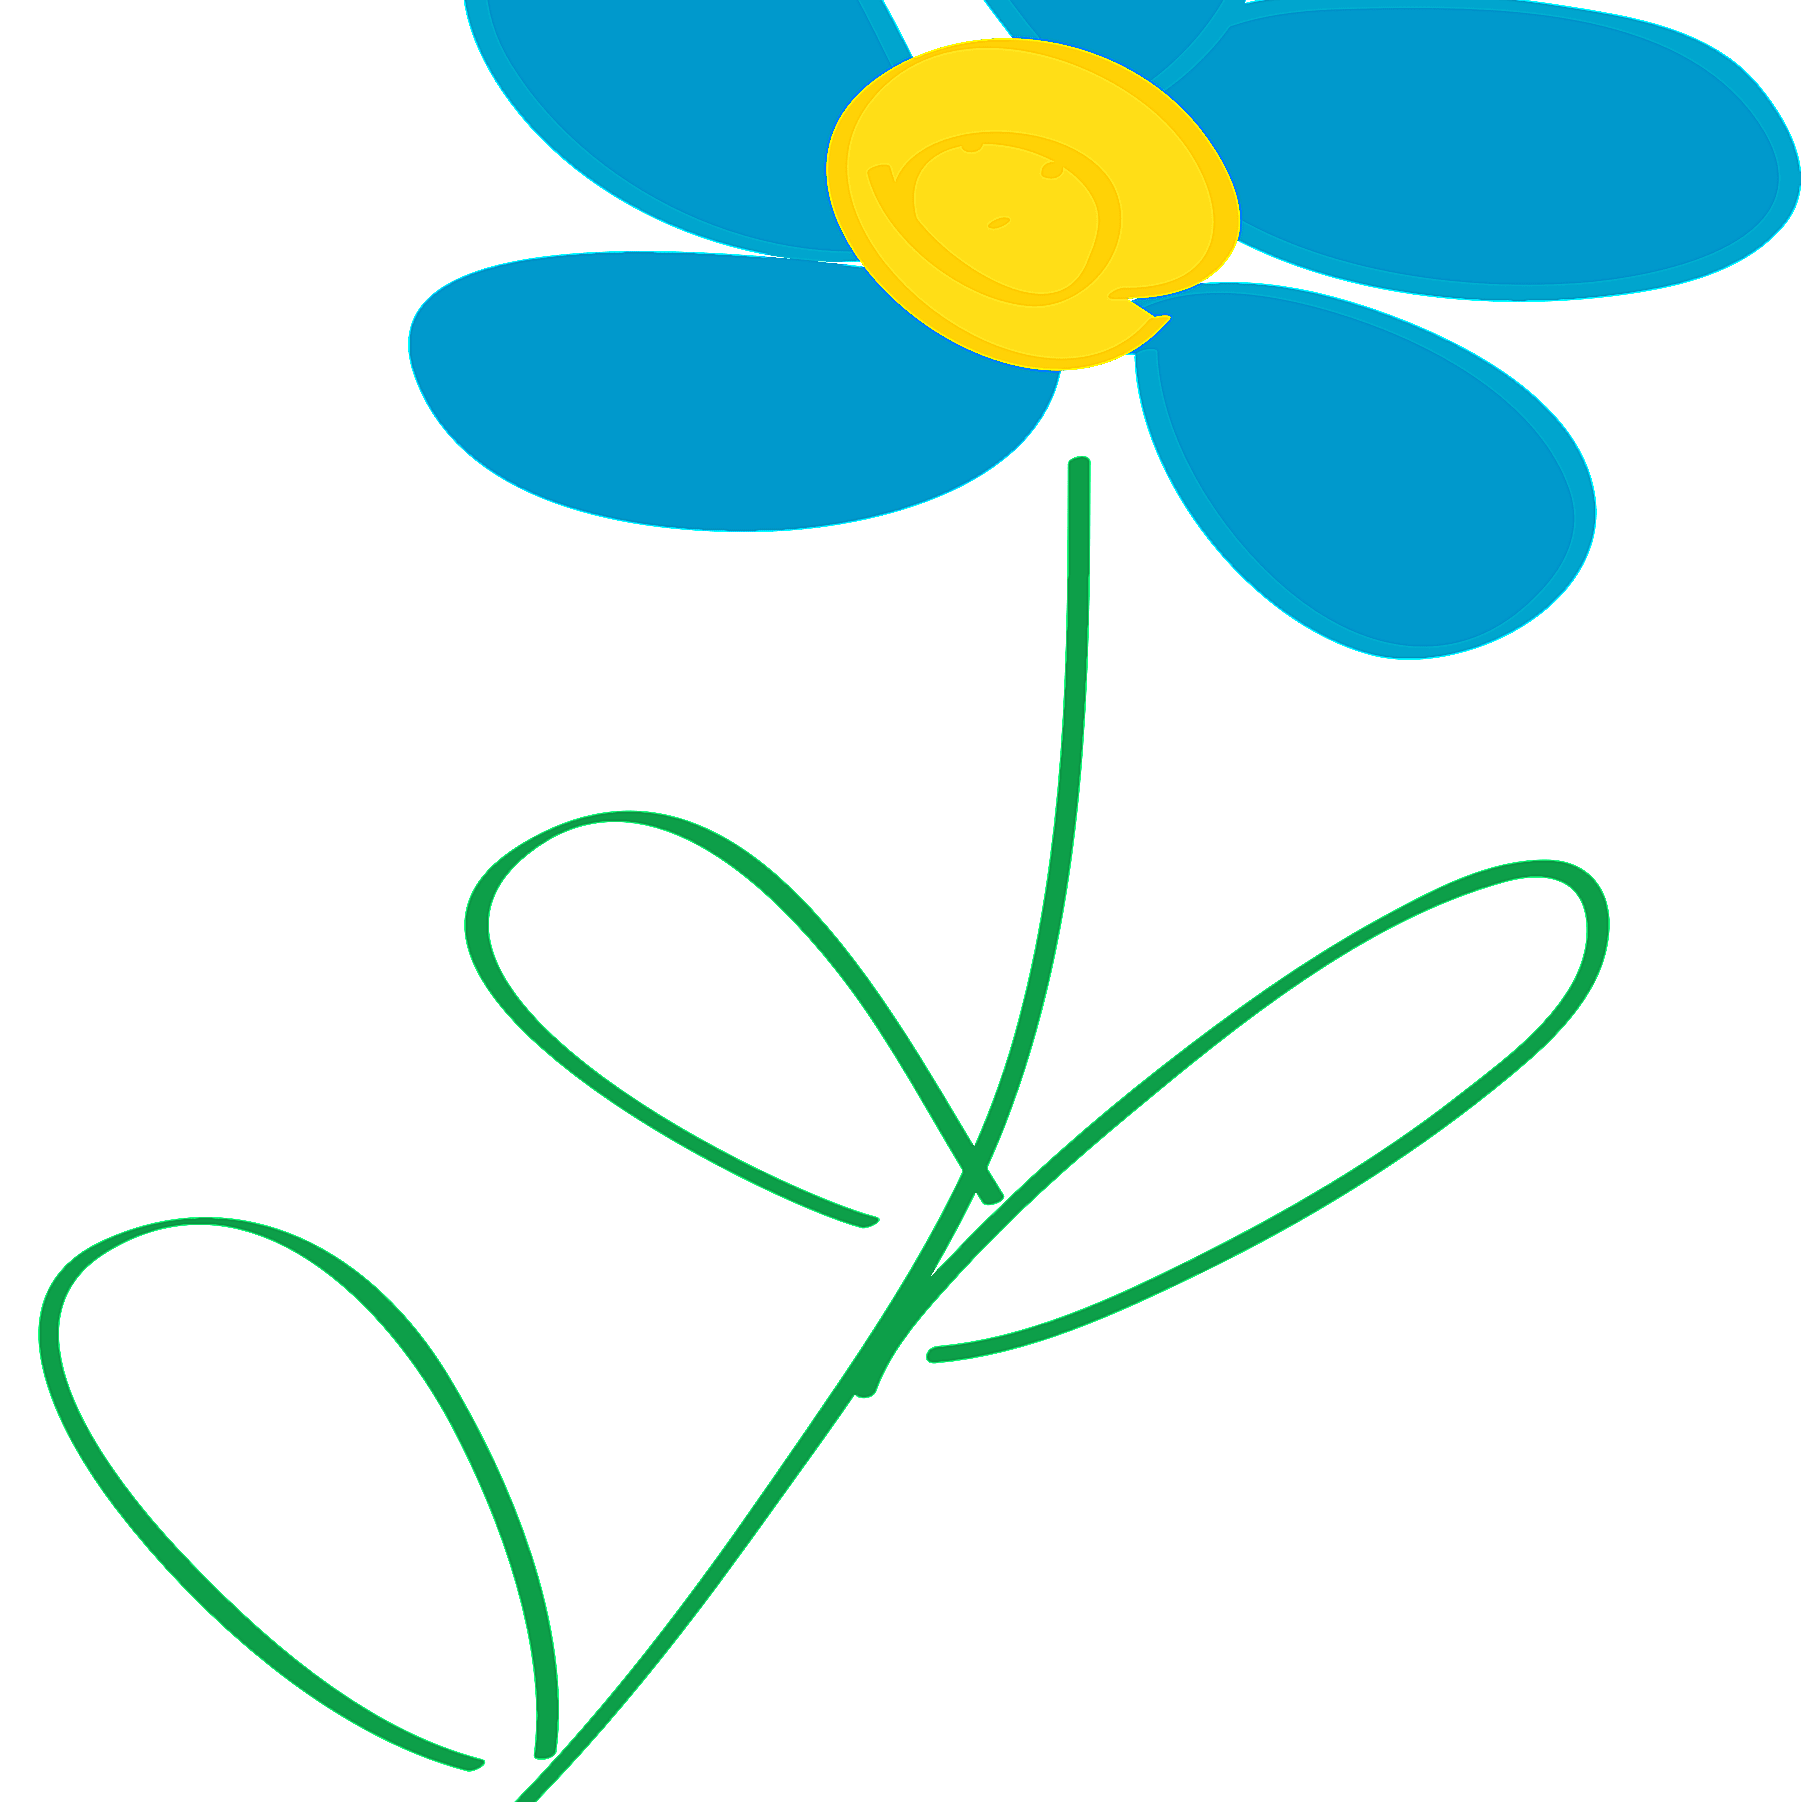 Free Flower Clip Art Images.